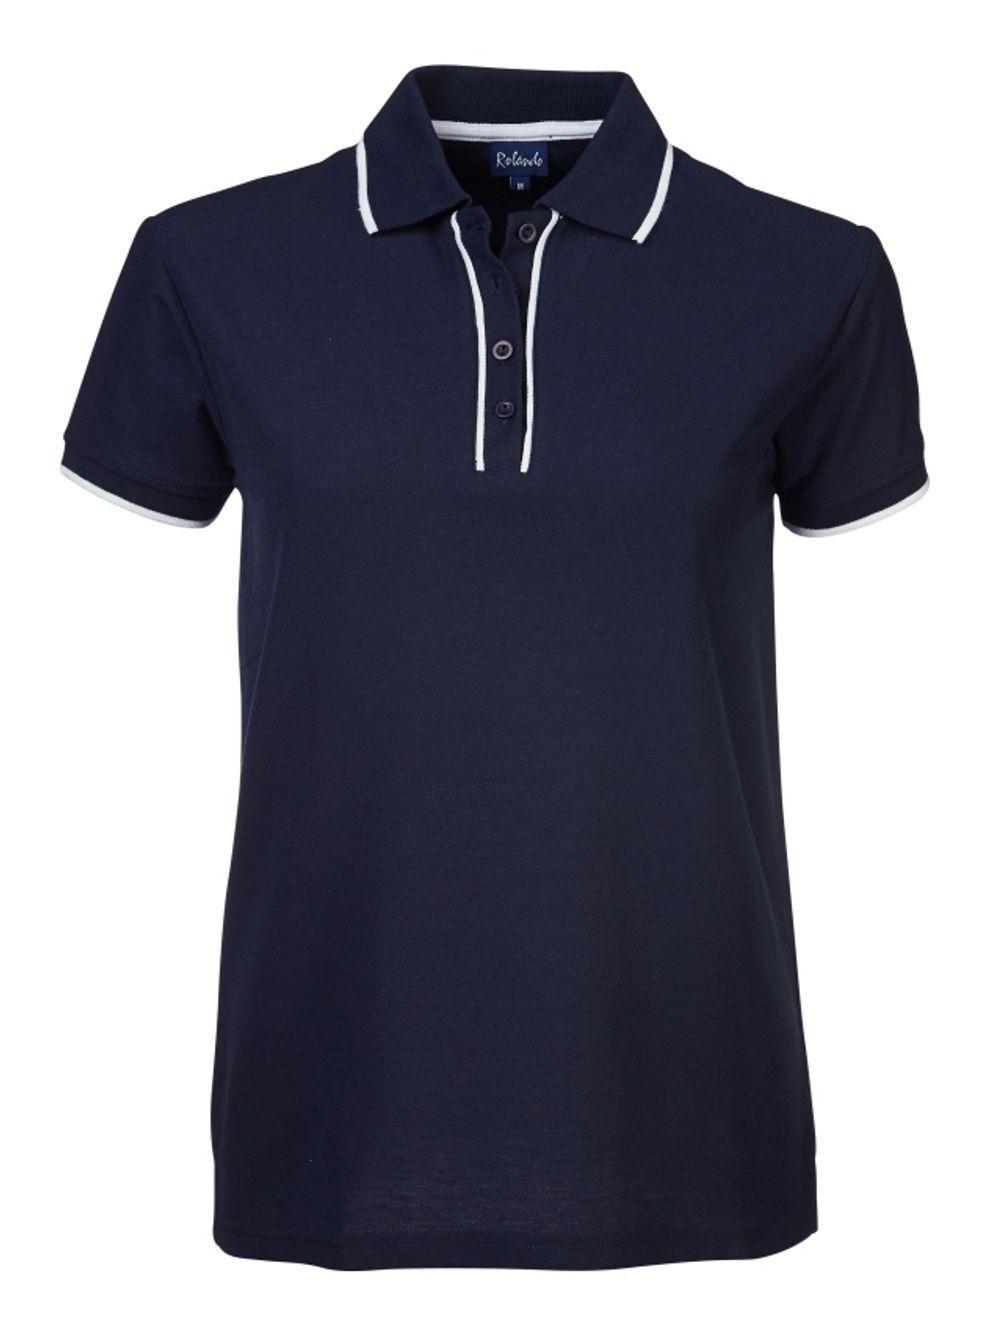 Ladies Arabella Golfer - Navy/white